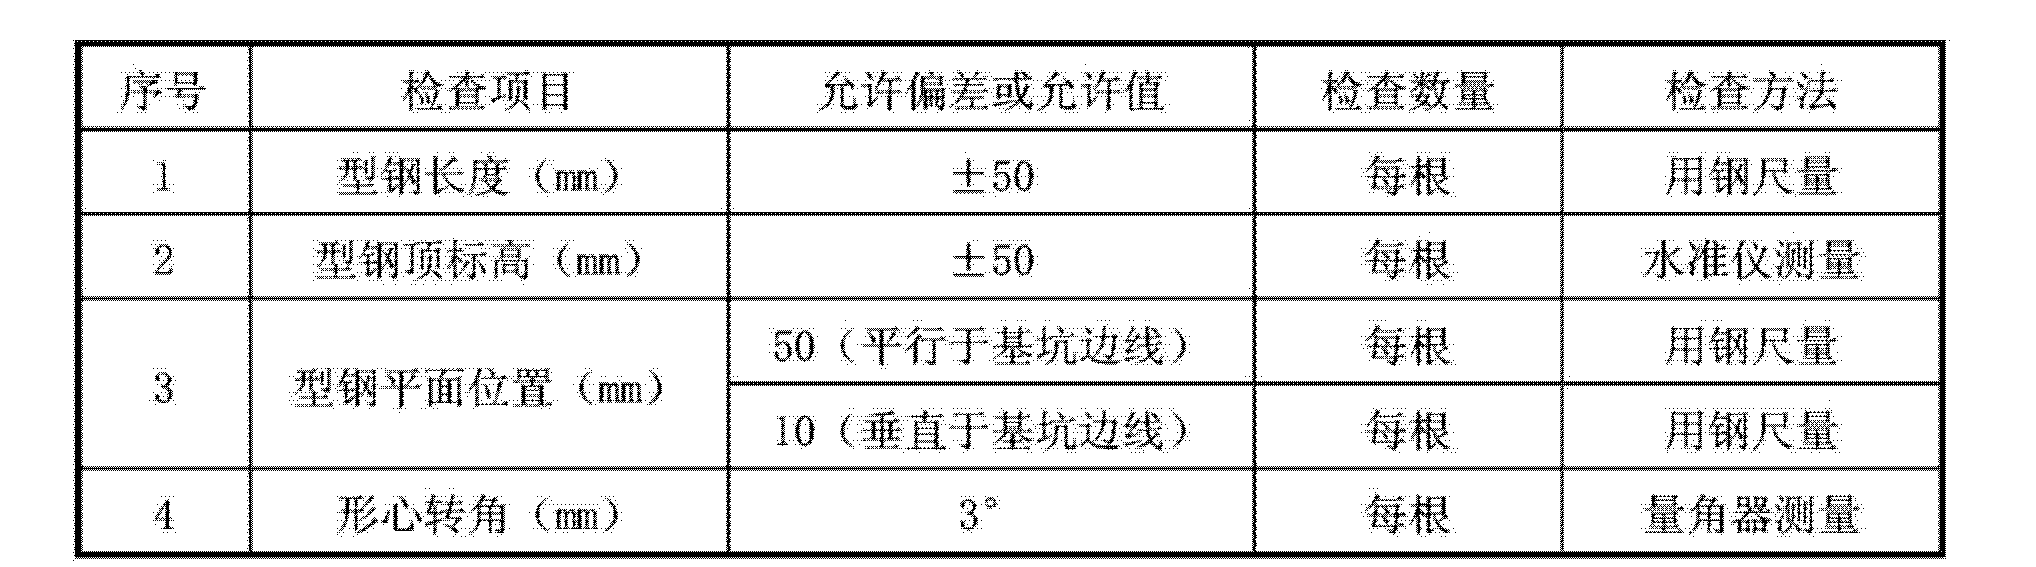 Figure CN203475440UD00071